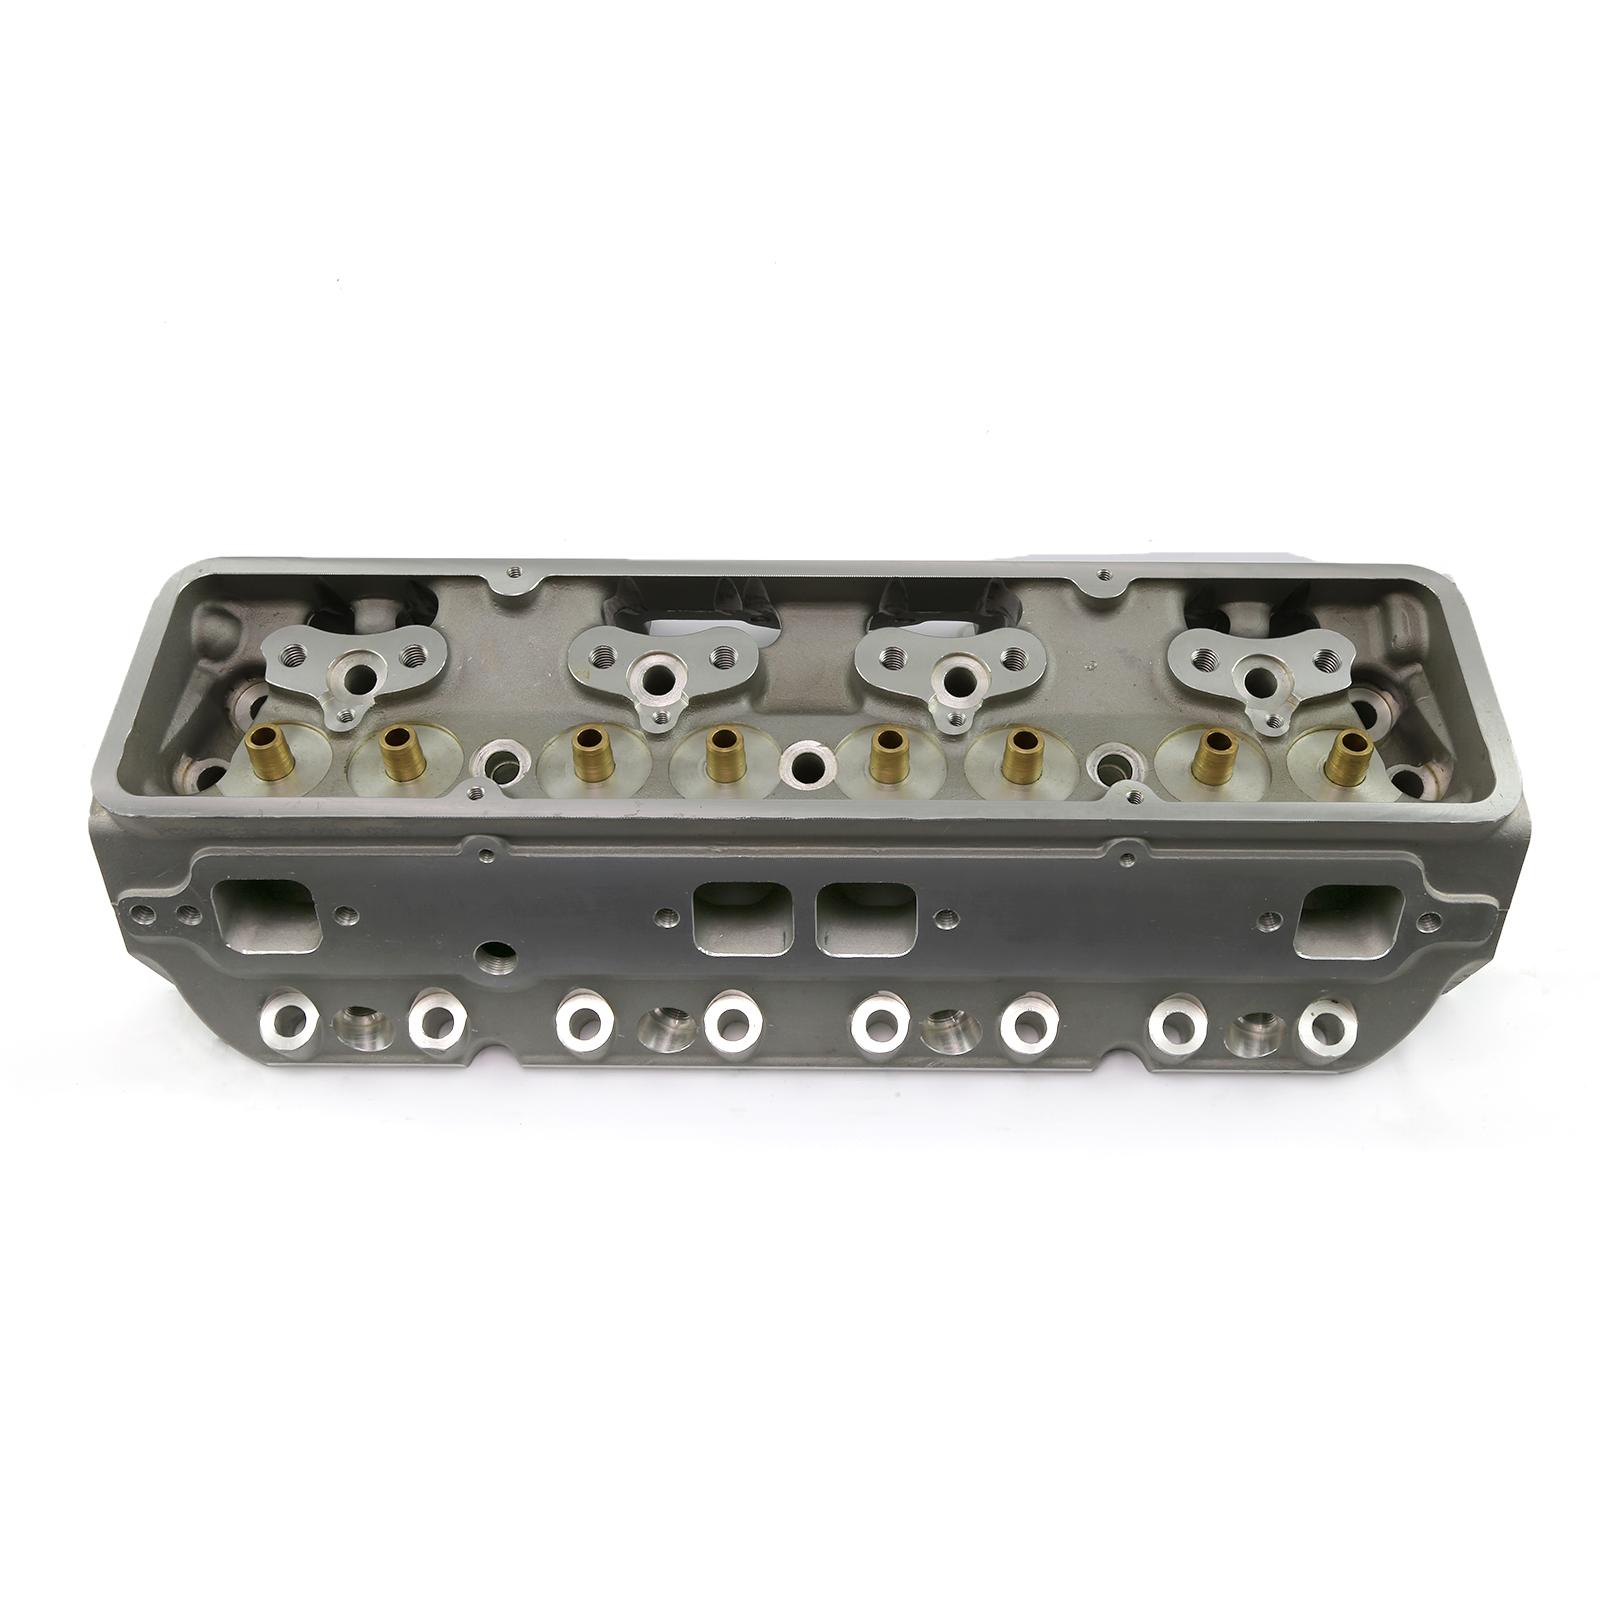 PCE® PCE281.1197 Chevy SBC 350 205cc 59cc Straight CNC Chamber Aluminum Bare Cylinder Head